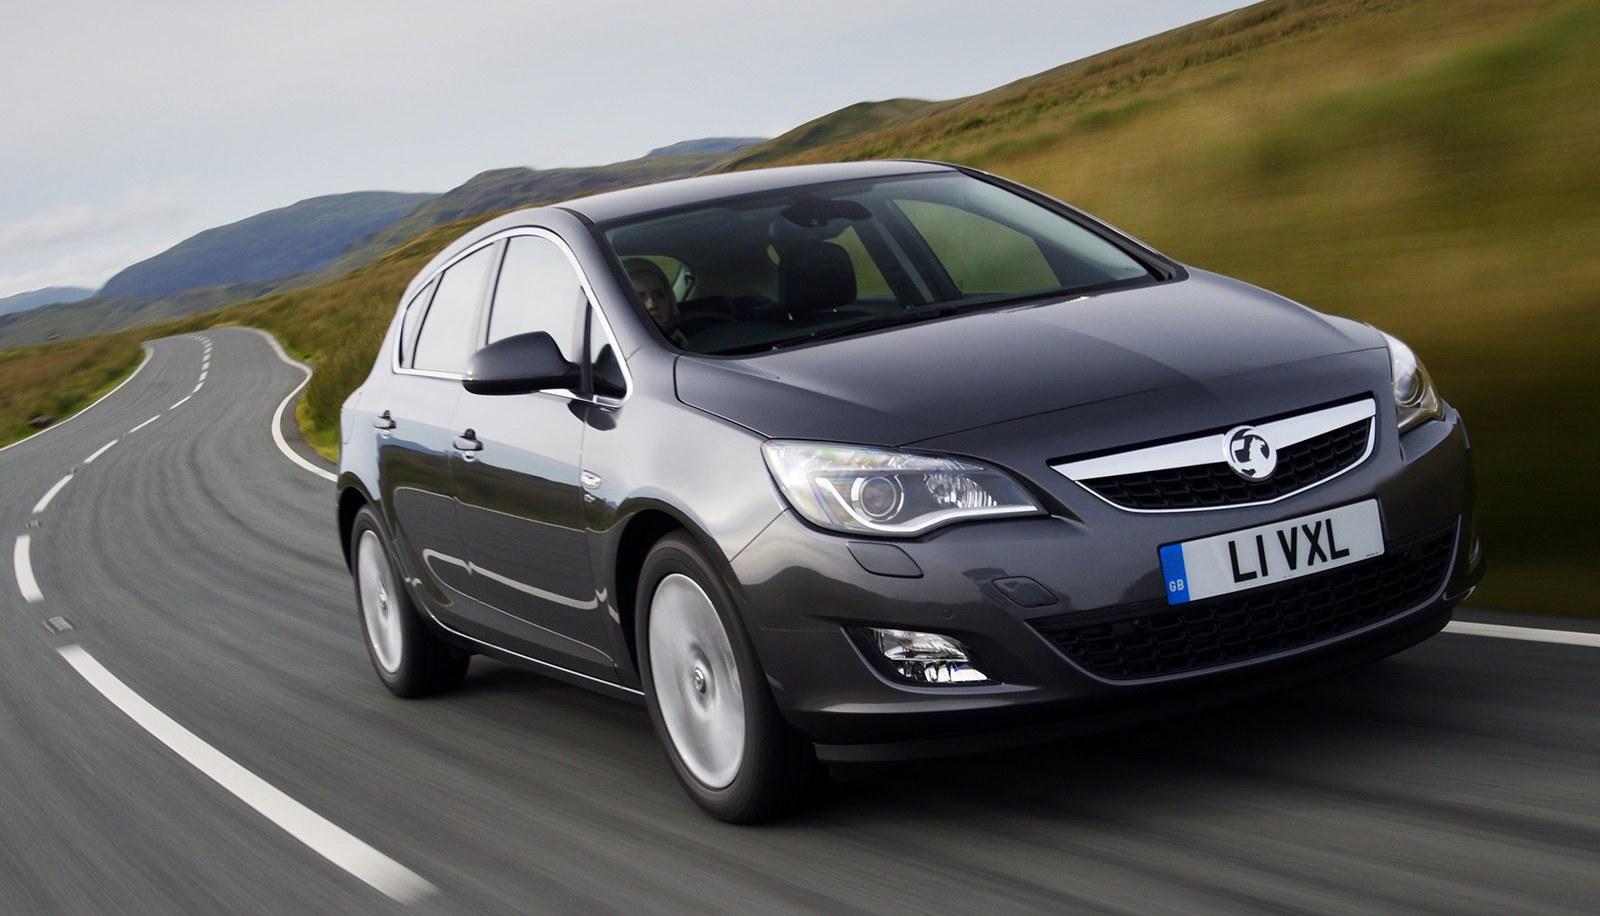 UK December 2010: Vauxhall Astra #1, Fiesta leader in Full Year Now